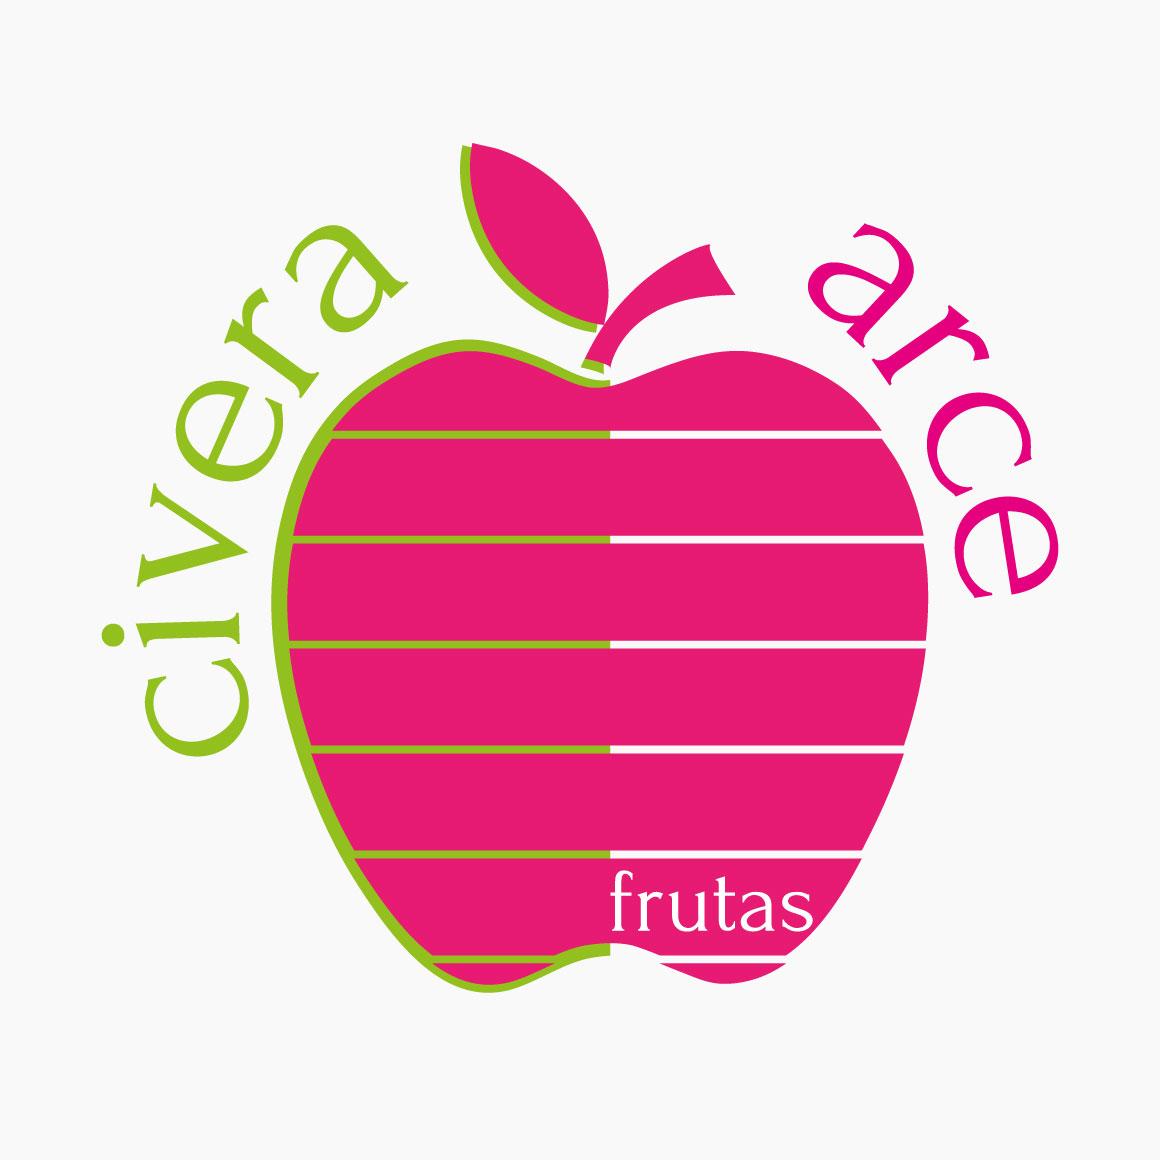 2a-Imagen-destada-Frutas-Civera-Arce